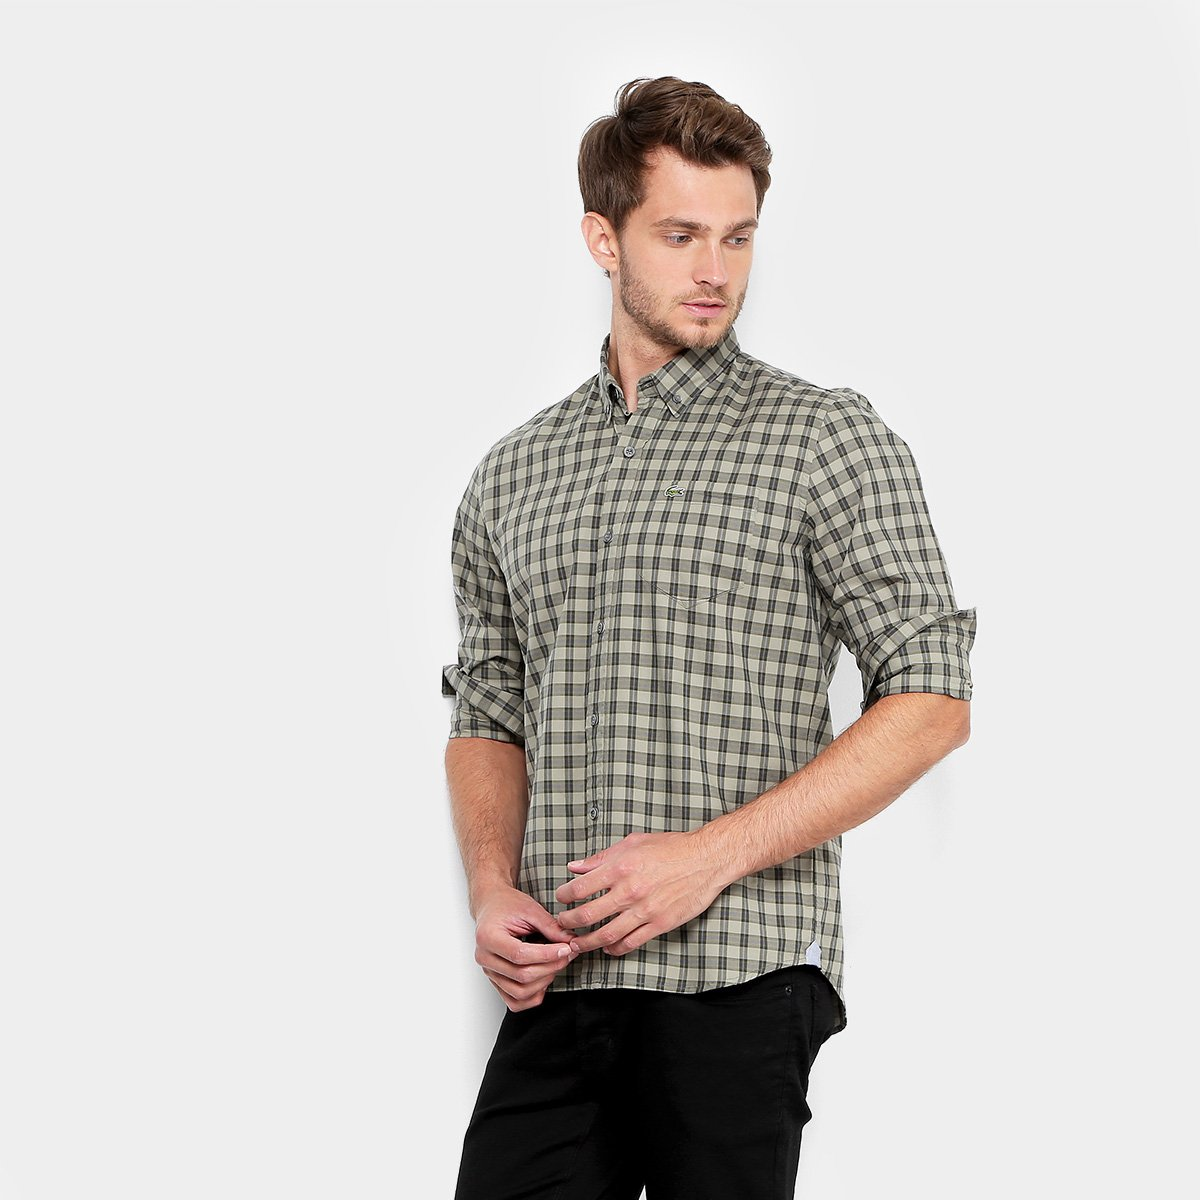 Camisa Lacoste Xadrez Regular Fit Bolso Masculina   Opte+ 4731681480